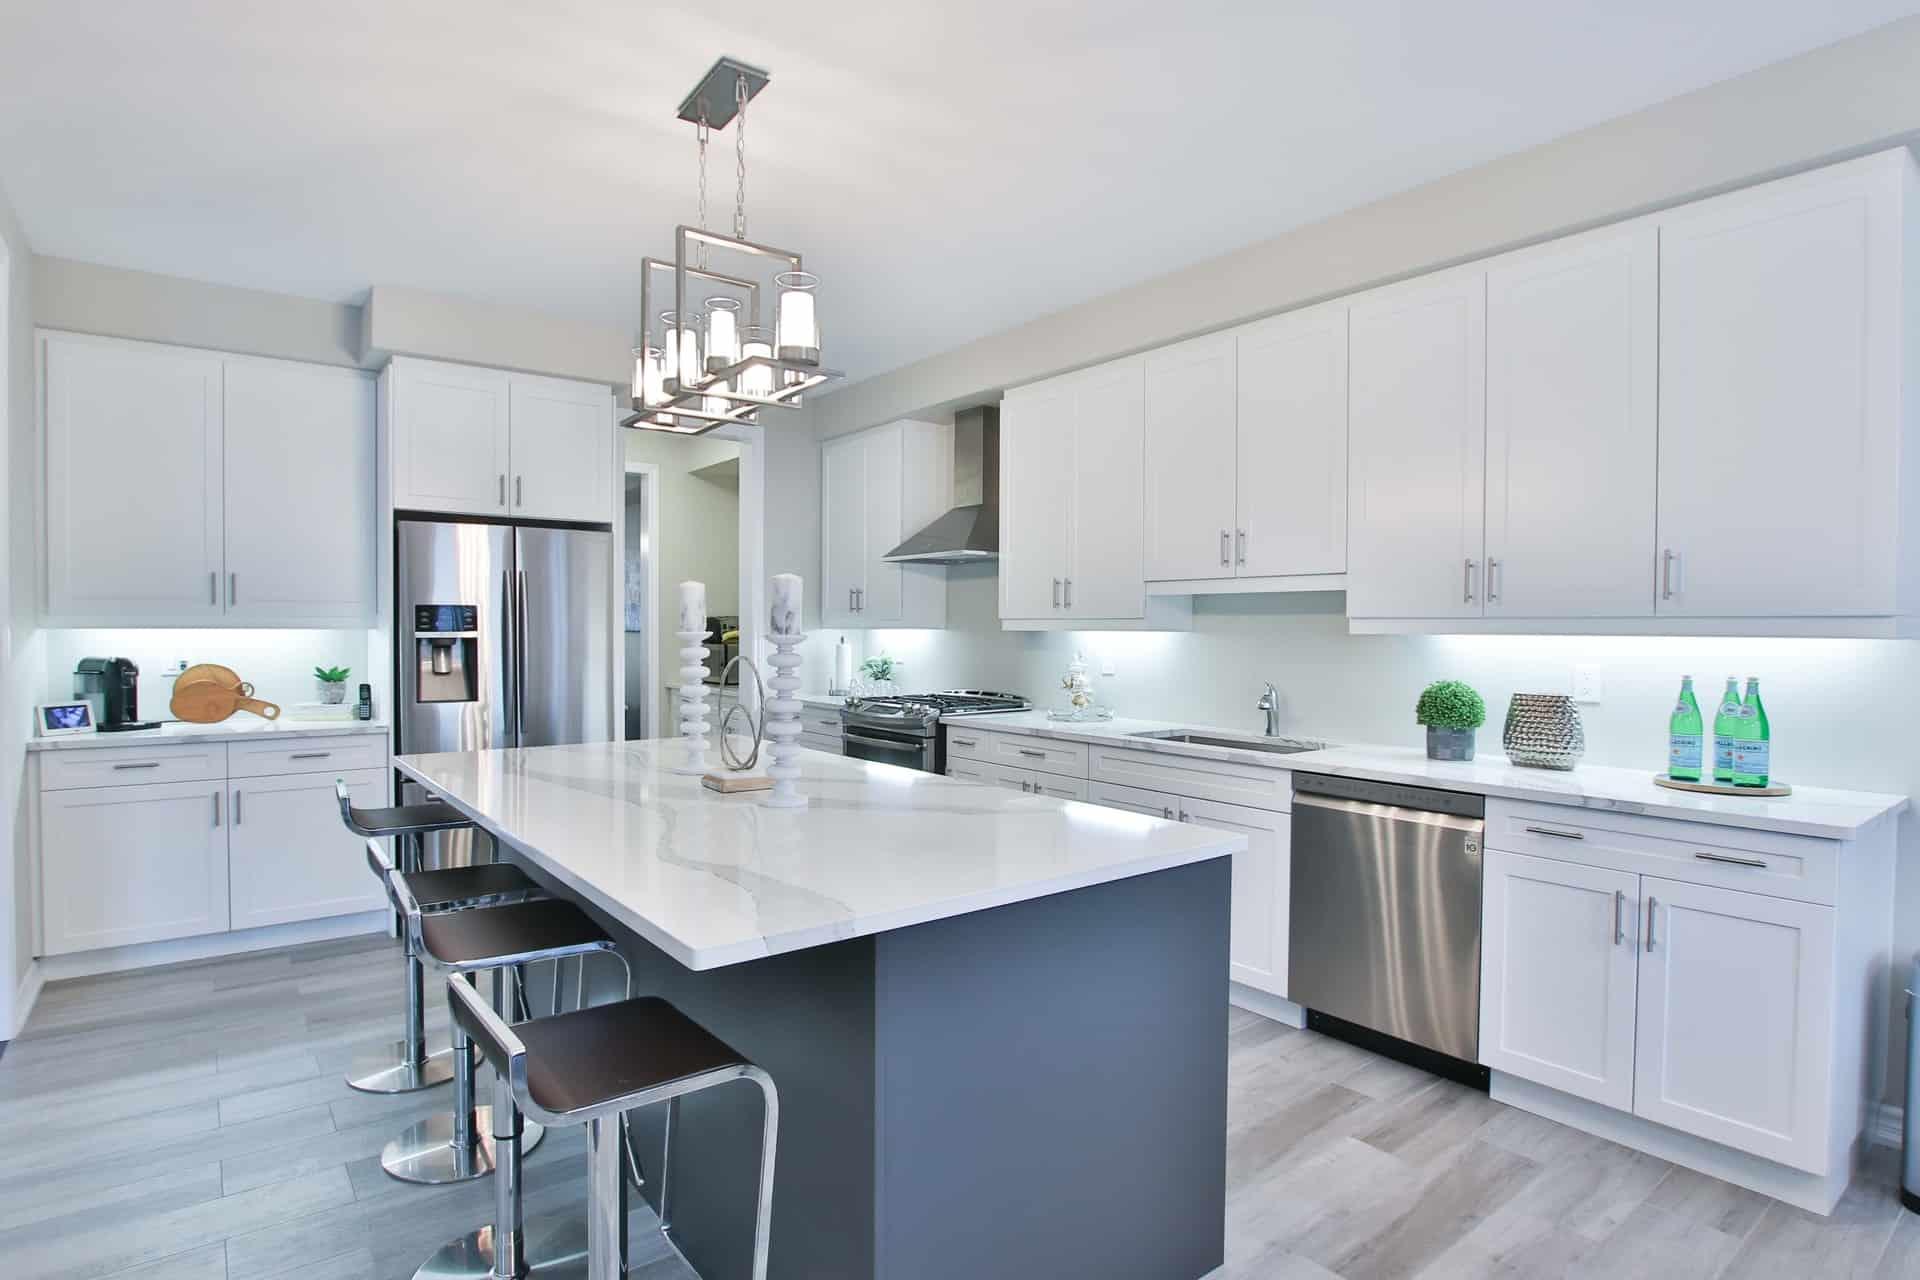 Save Money New Appliances Header Image